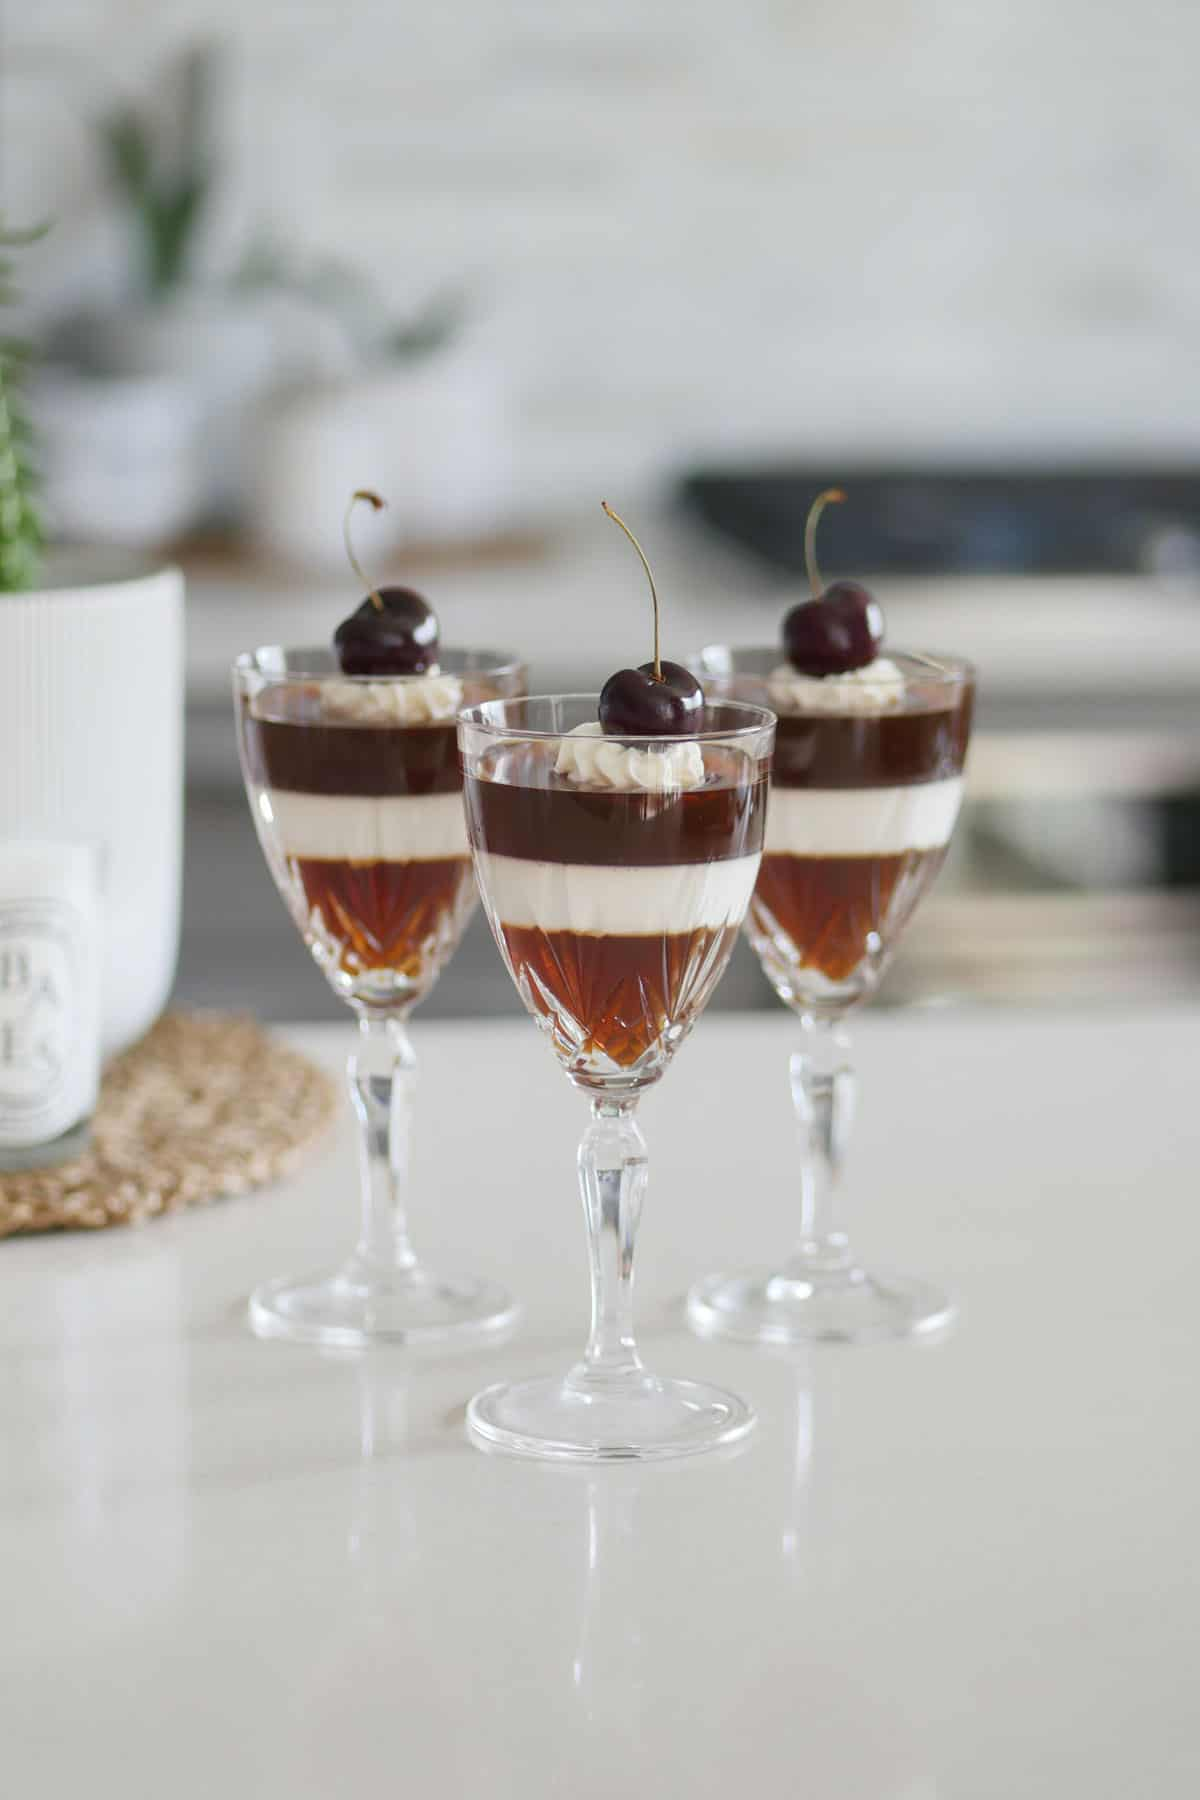 Three coffee jelly desserts in crystal stemware on a white quartz countertop.